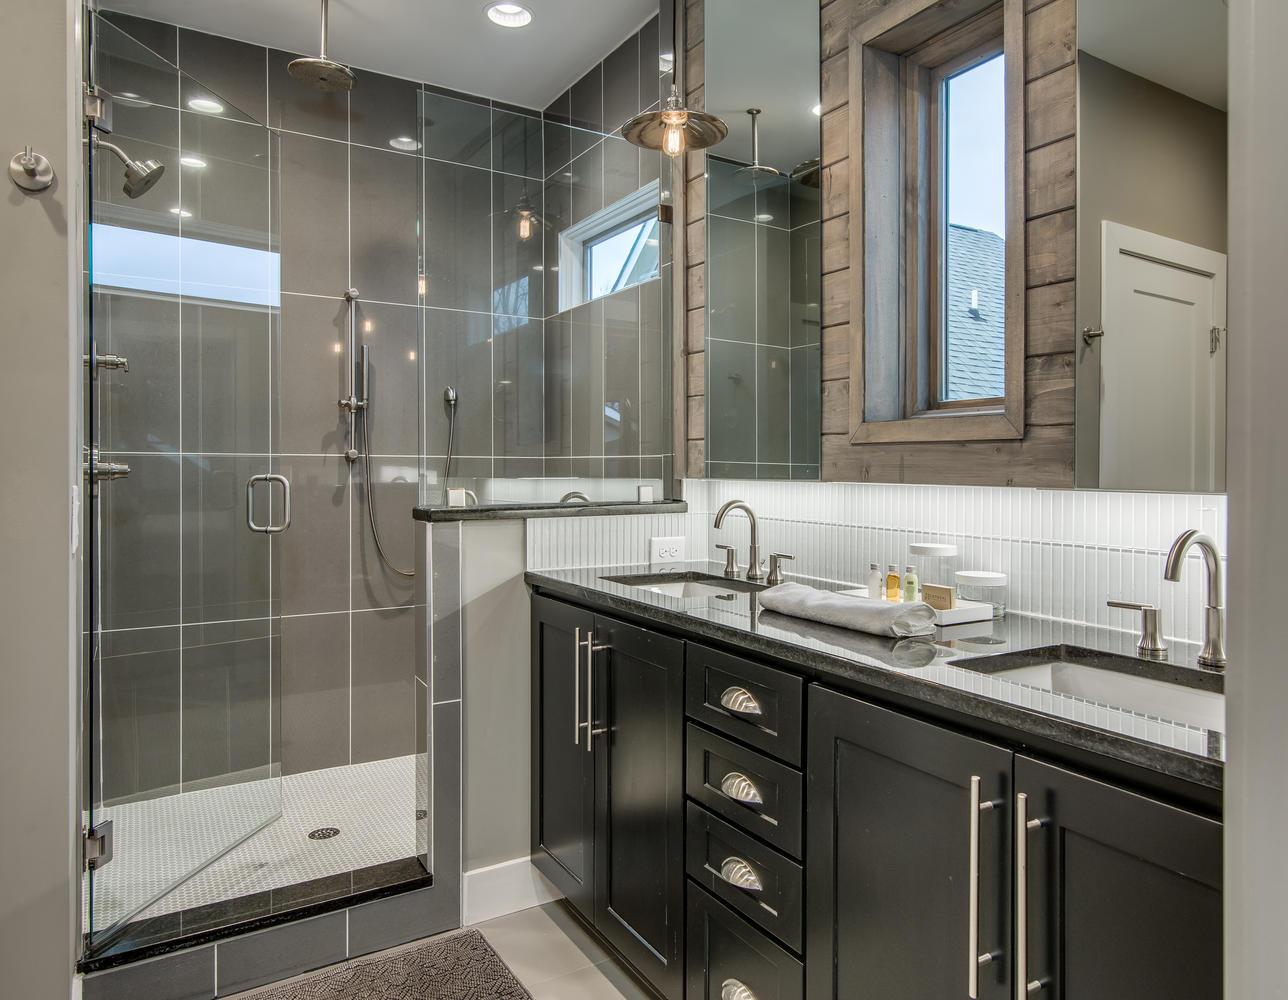 House-Plans-Online-Duplex-Nashville-Peggy-Newman-Bath-Master-1613.jpg